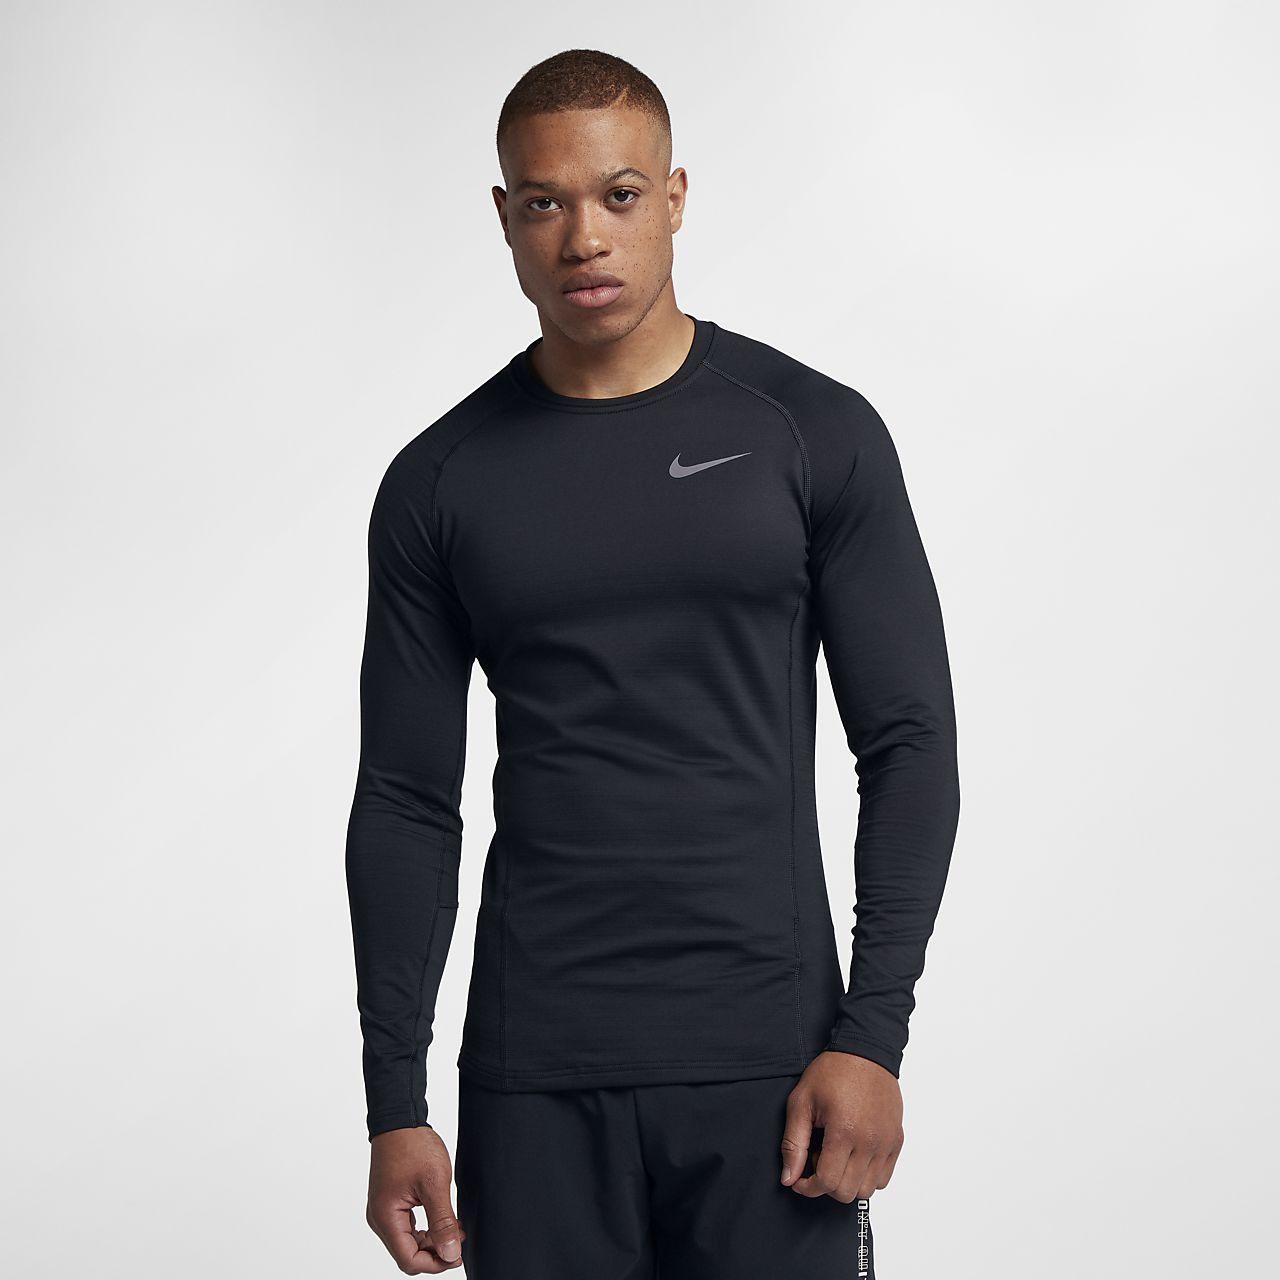 Maglia da training a manica lunga Nike Pro Warm - Uomo